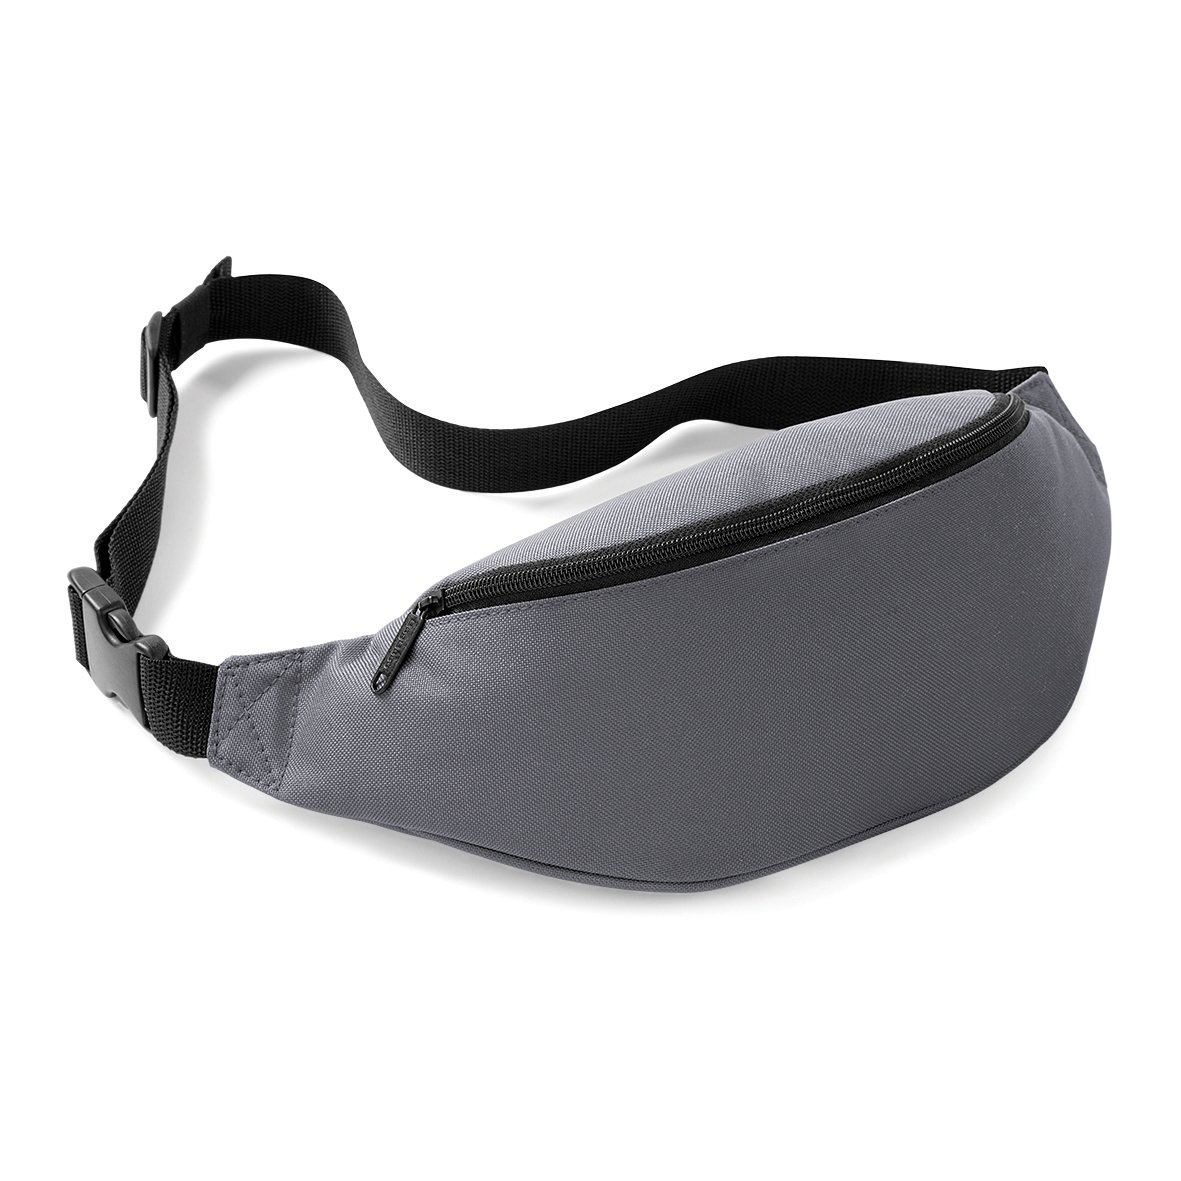 Bagbase Belt Bag